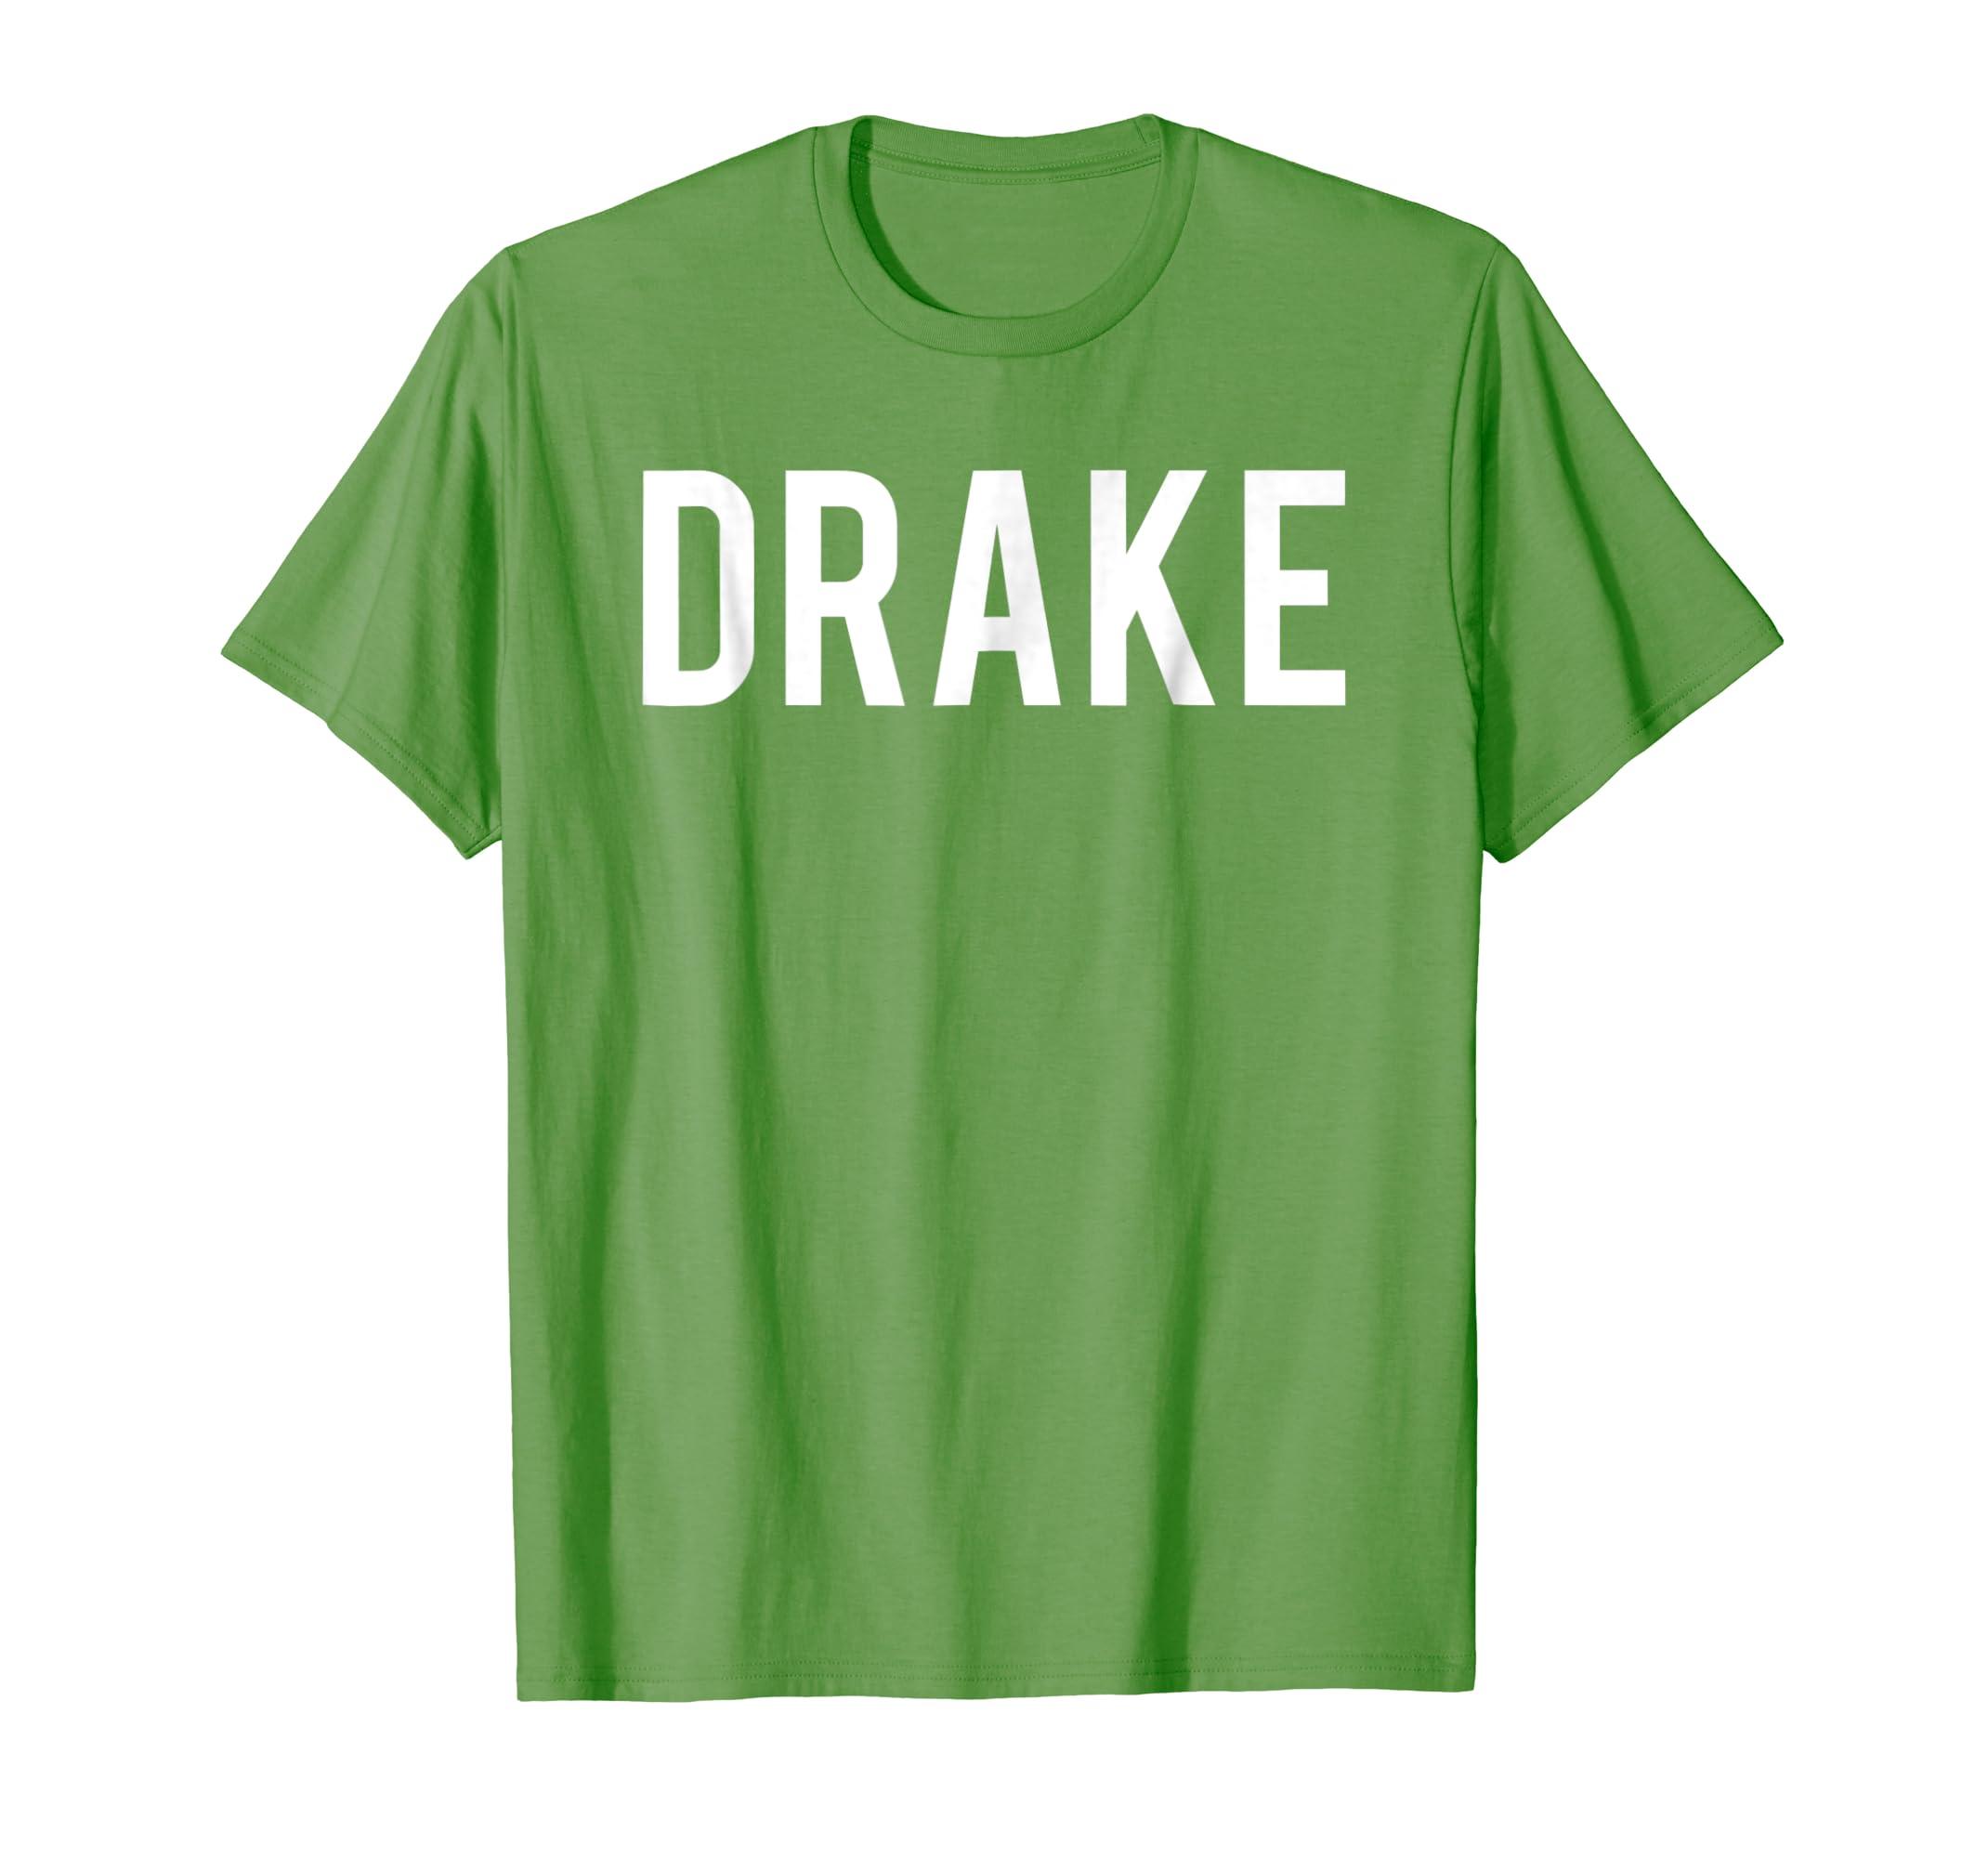 01ddf946cd3 Amazon.com  Drake T Shirt - Cool new funny name fan cheap gift tee  Clothing